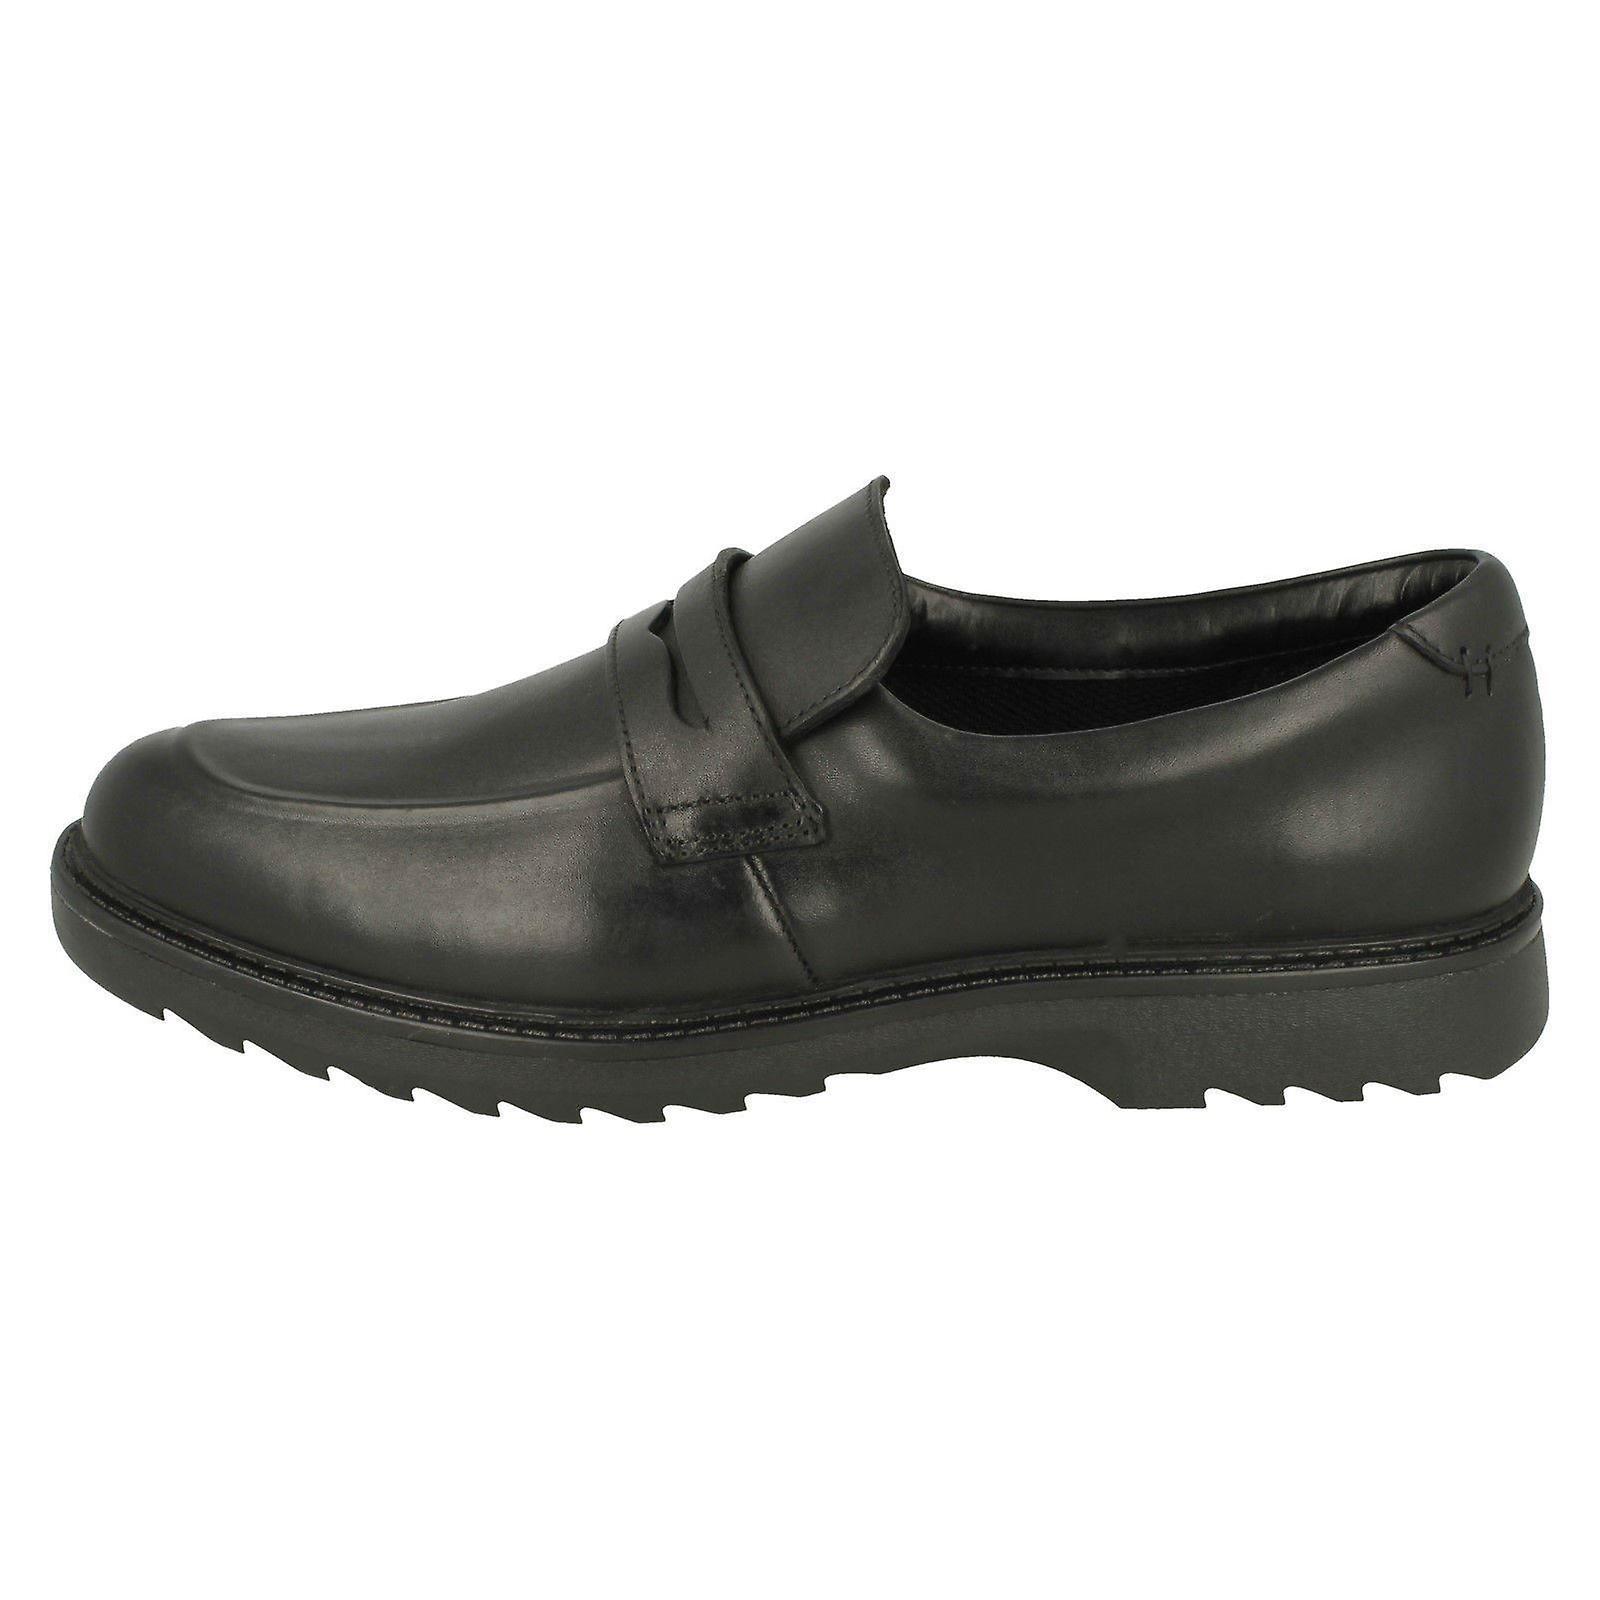 Boys Clarks Slip On Formal Shoes Asher Stride